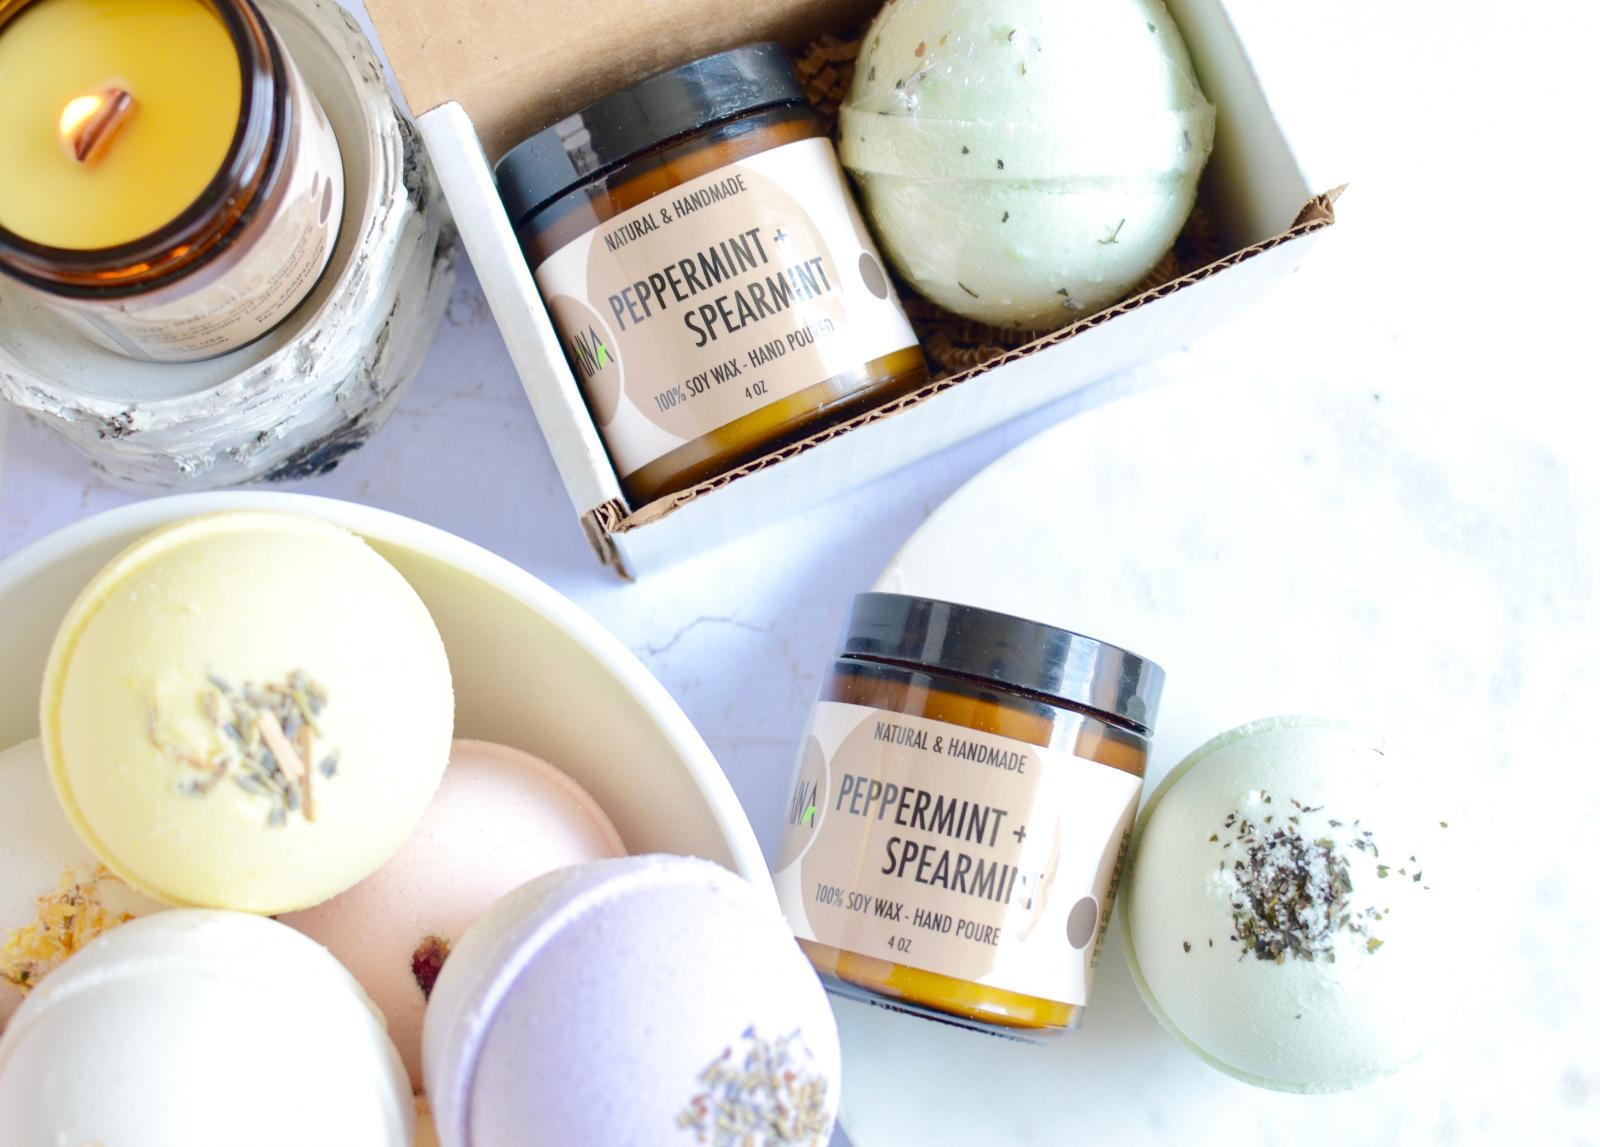 Christmas Gift under $25 - 100% Soy Candle + Aromatherapy Bath Bomb Gift Set